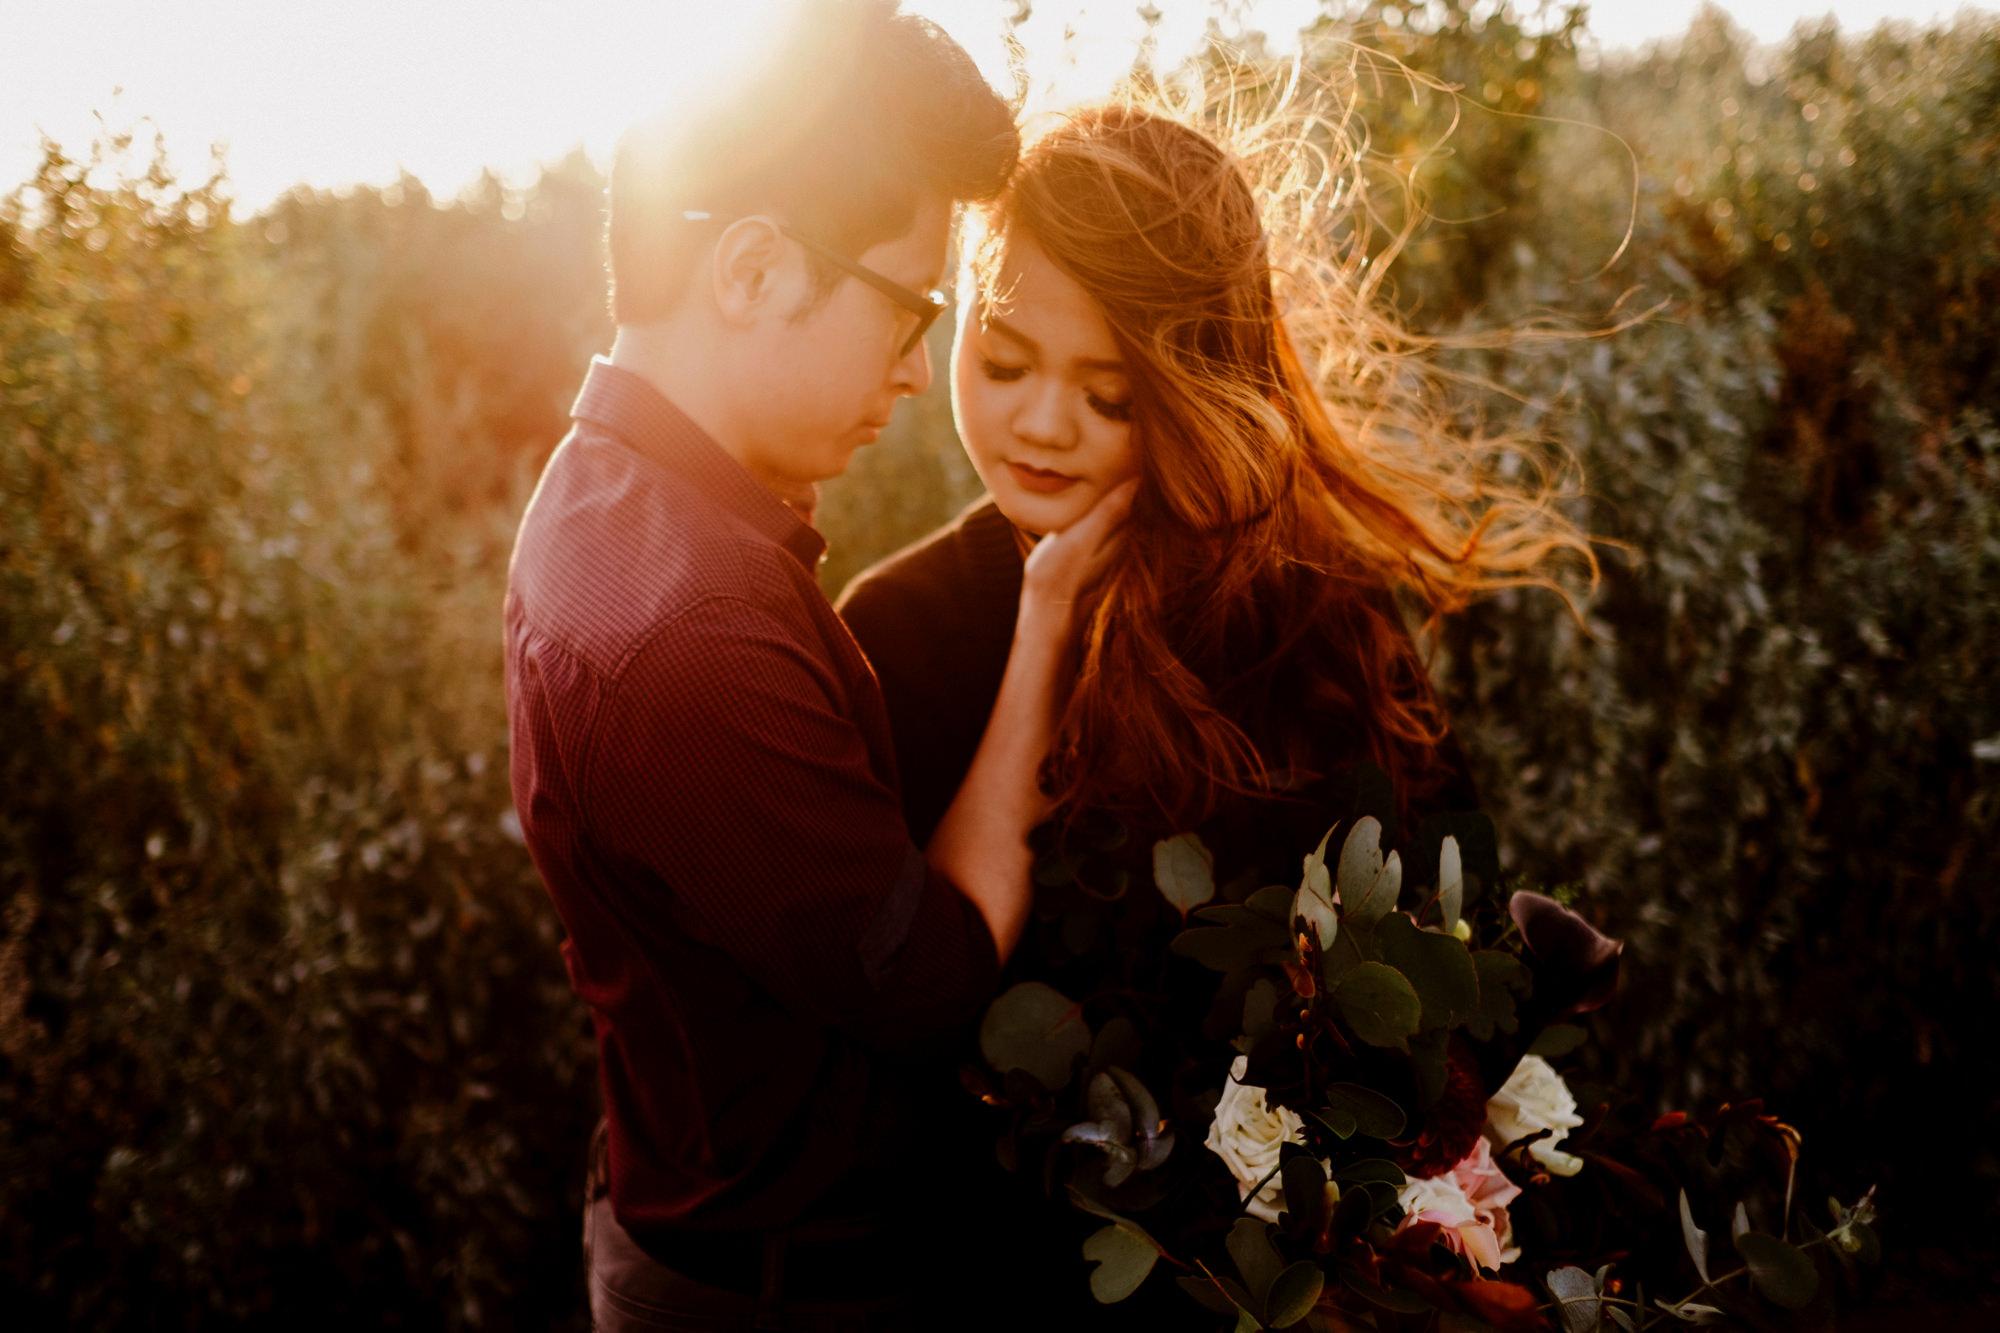 040-melbourne-engagement-wedding-photography